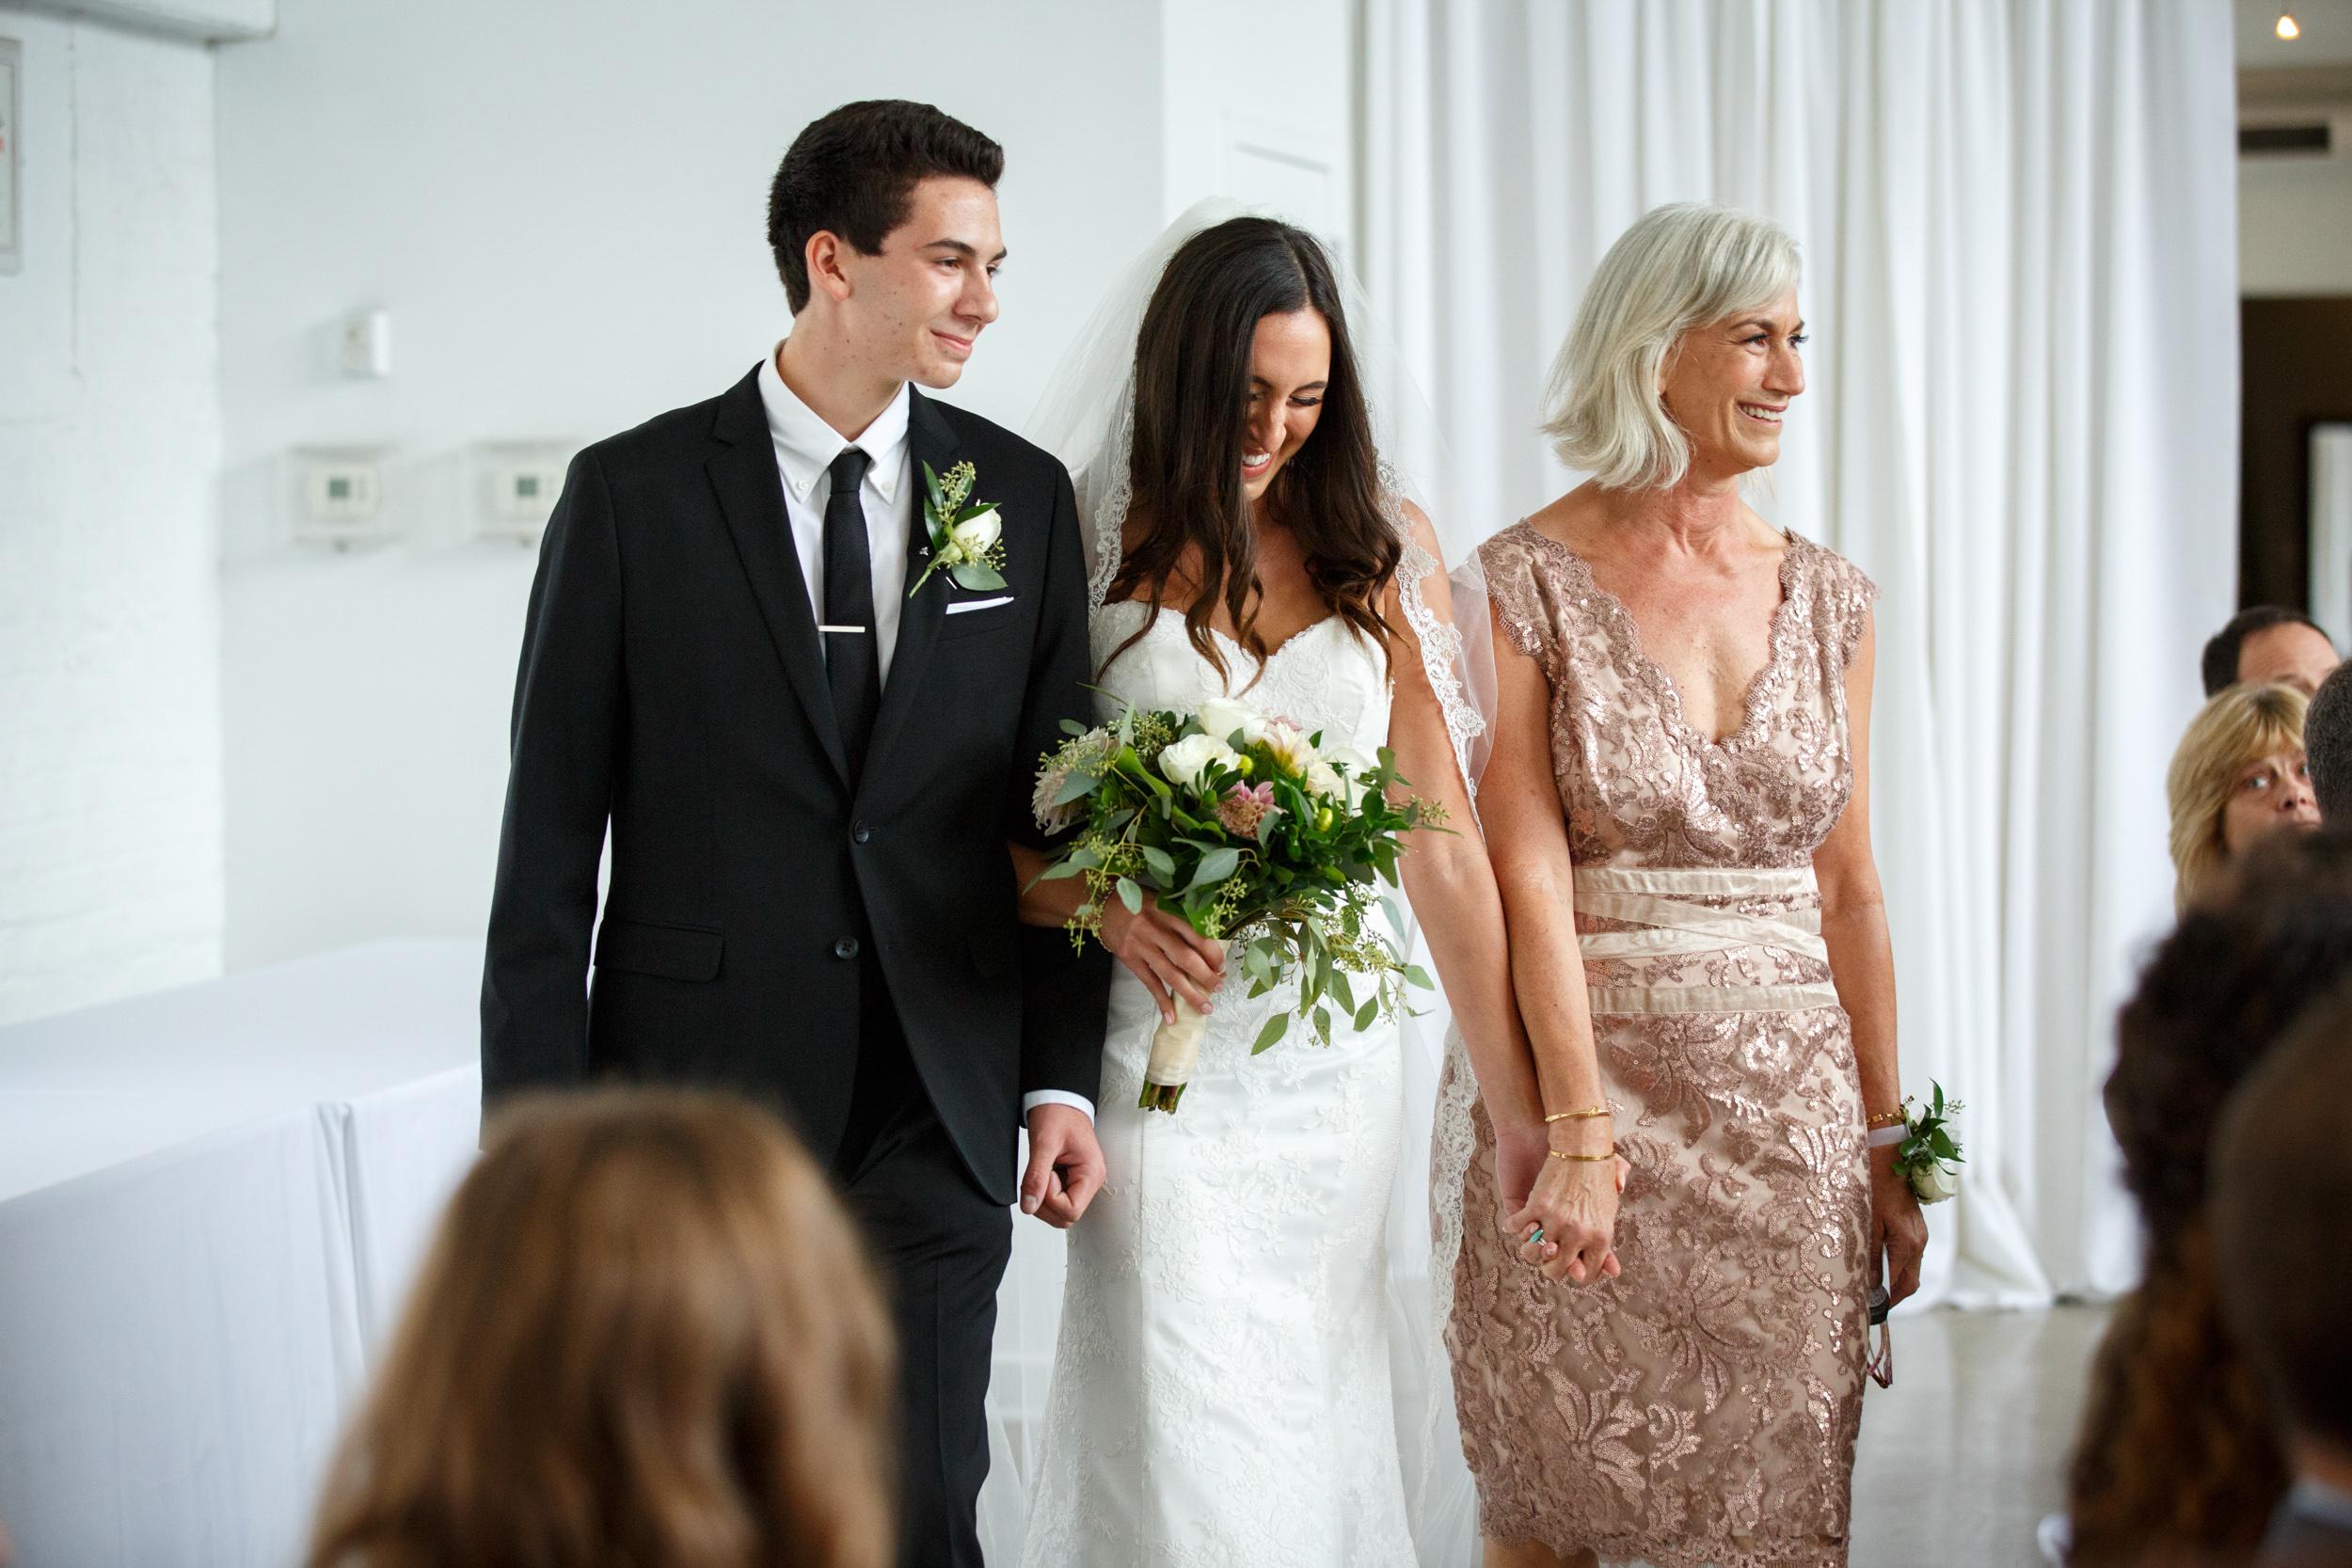 9-09-2016 Flora & Colin wedding photography by Brian Milo-139.jpg